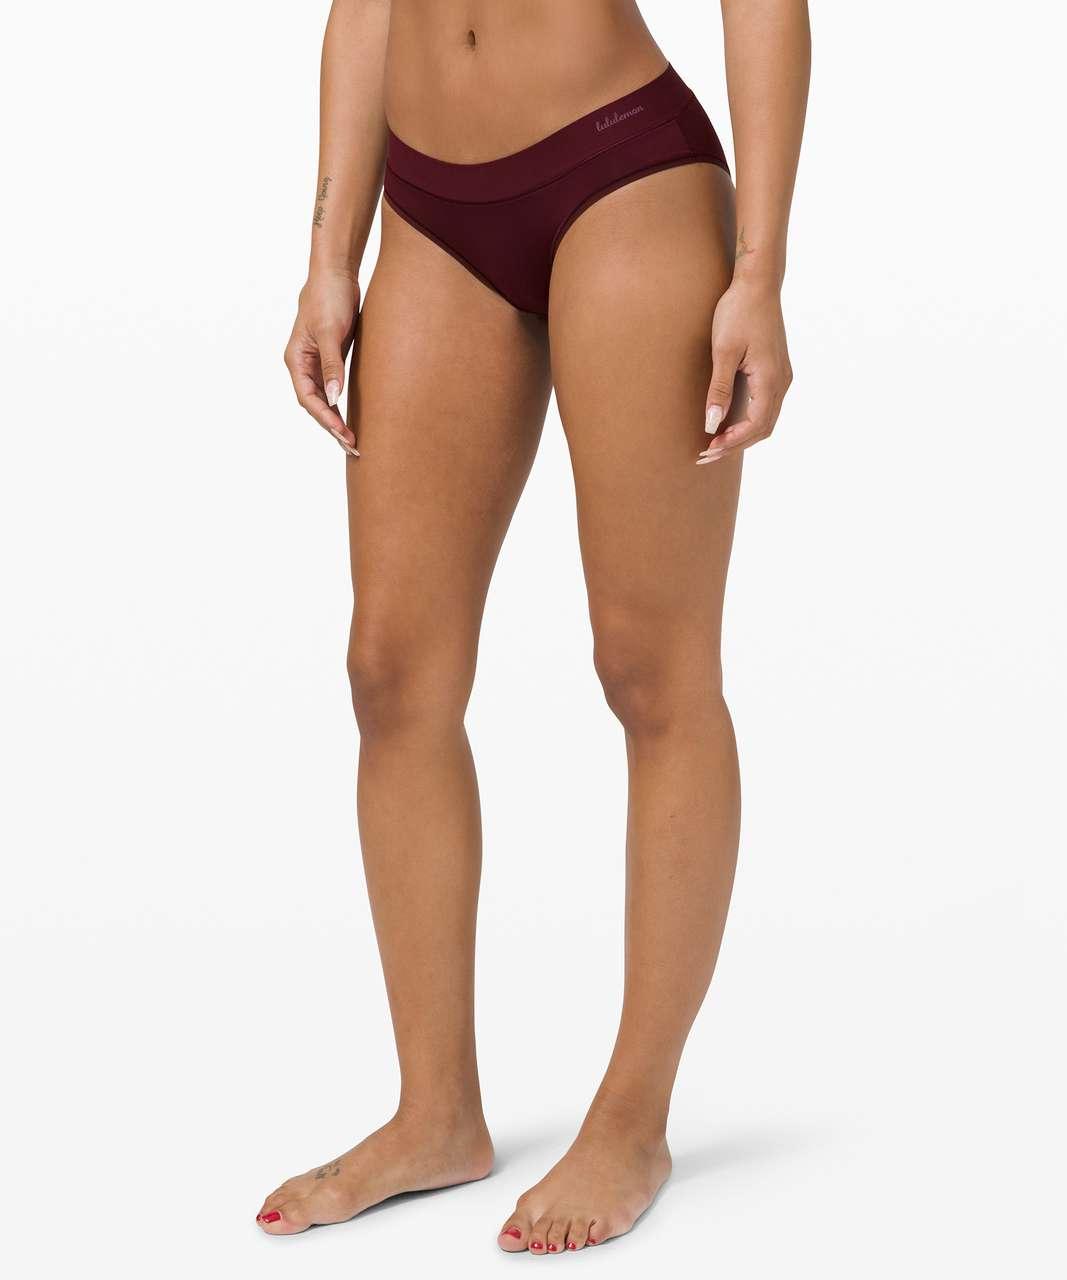 Lululemon Soft Breathable Bikini - Garnet